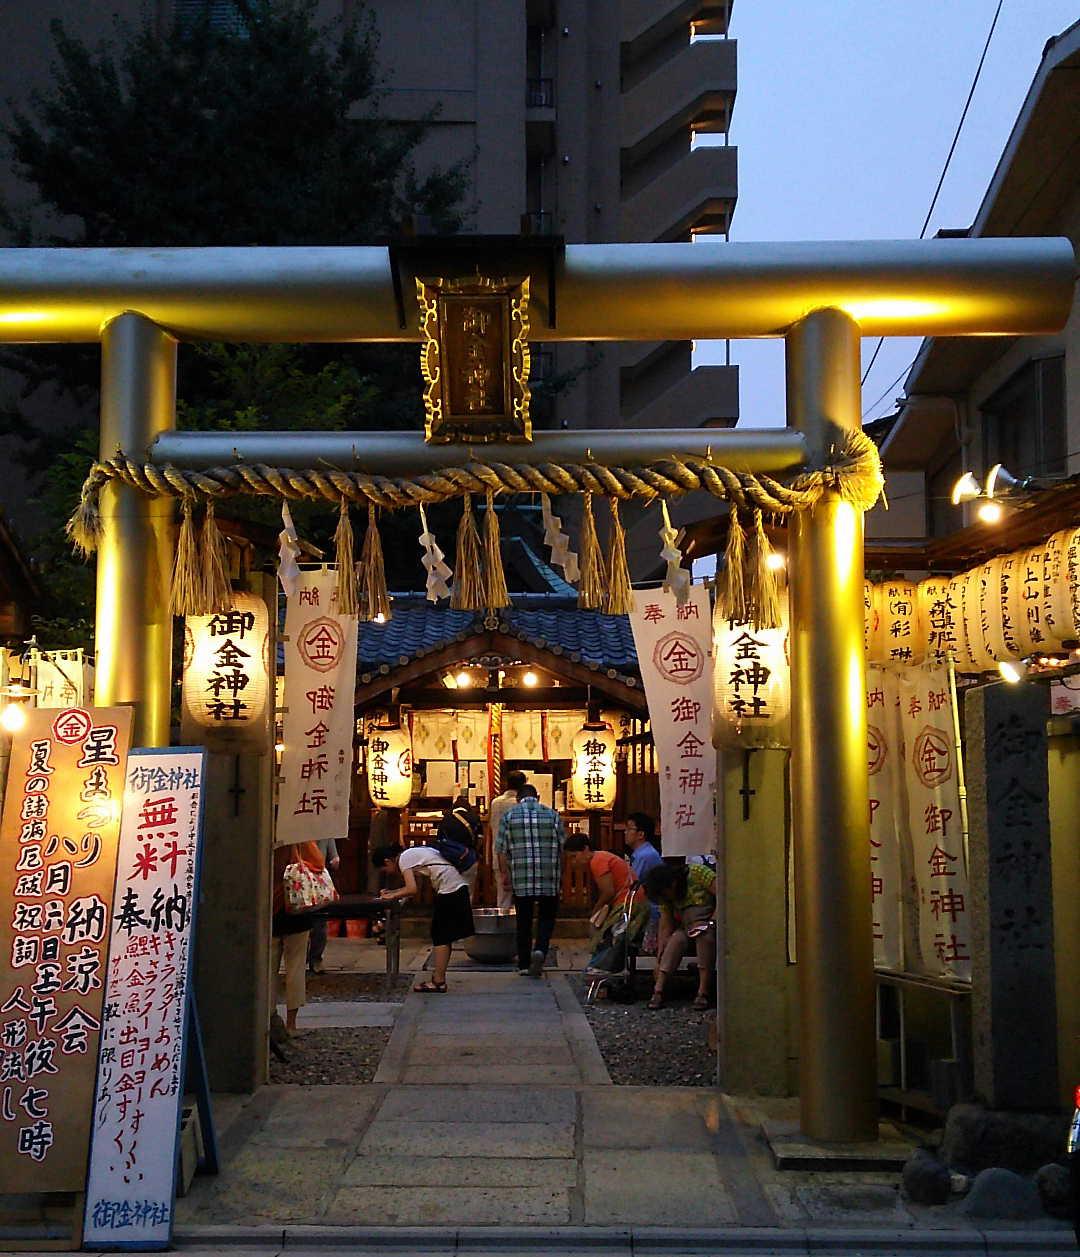 Entry5 運気がupする!開運神社の高画質壁紙画像まとめ! 写真まとめサイト Pictas